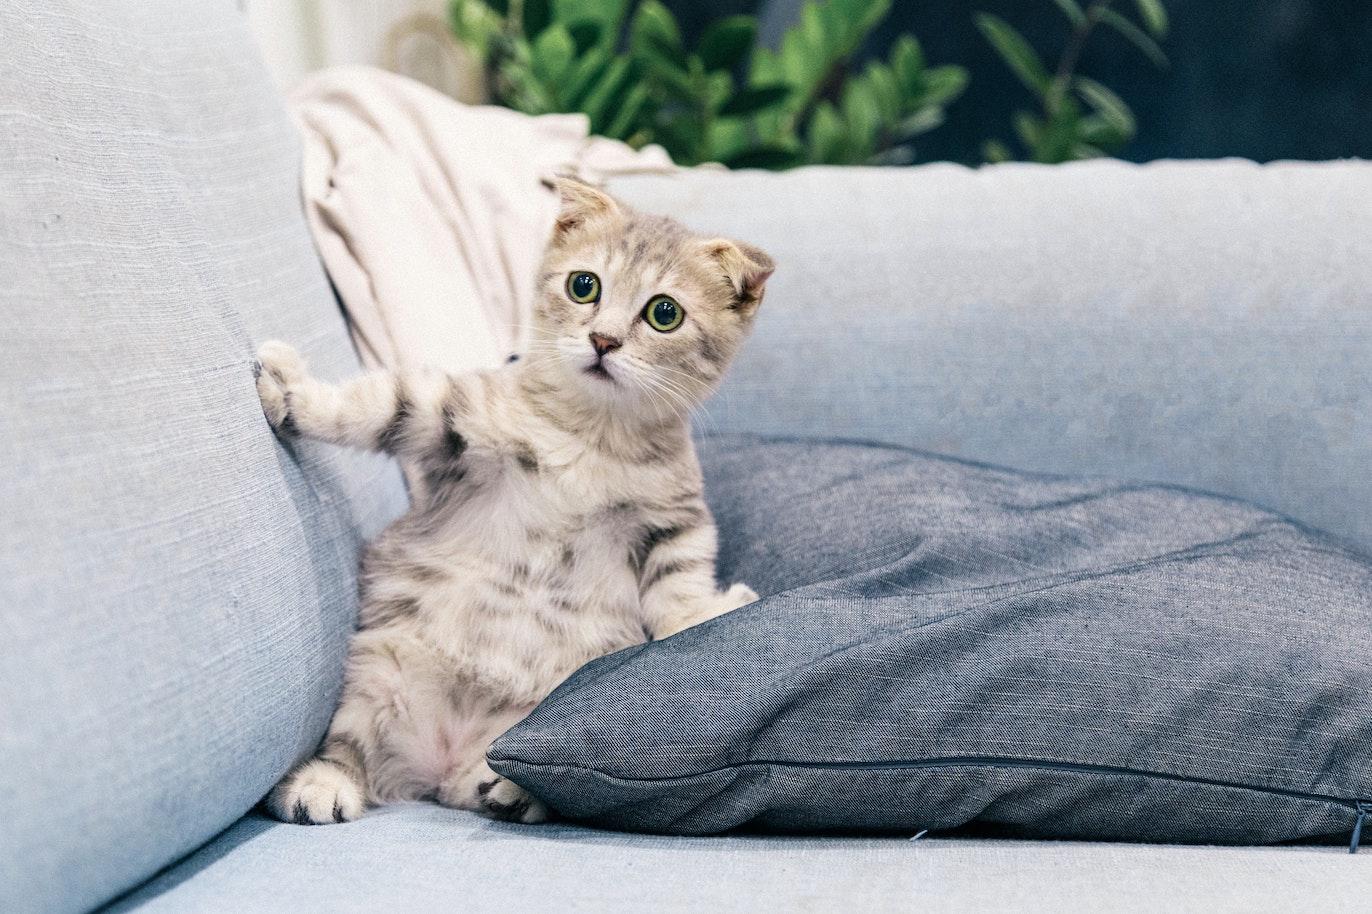 Kitten looking surprised